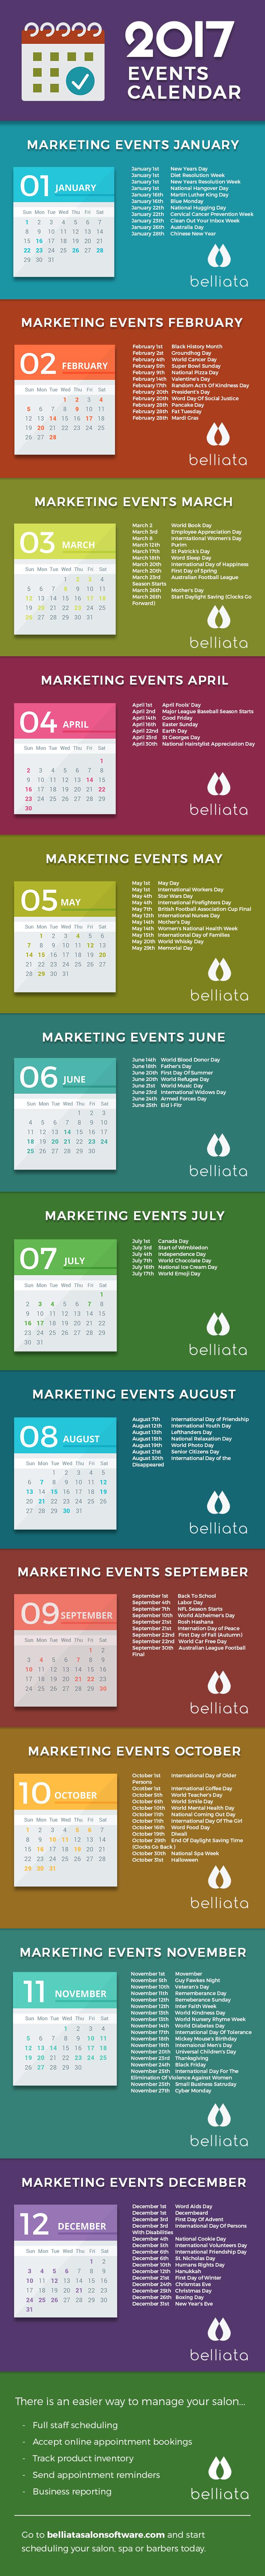 Is Your Salon Marketing Plan  Ready To Go Belliata Salon